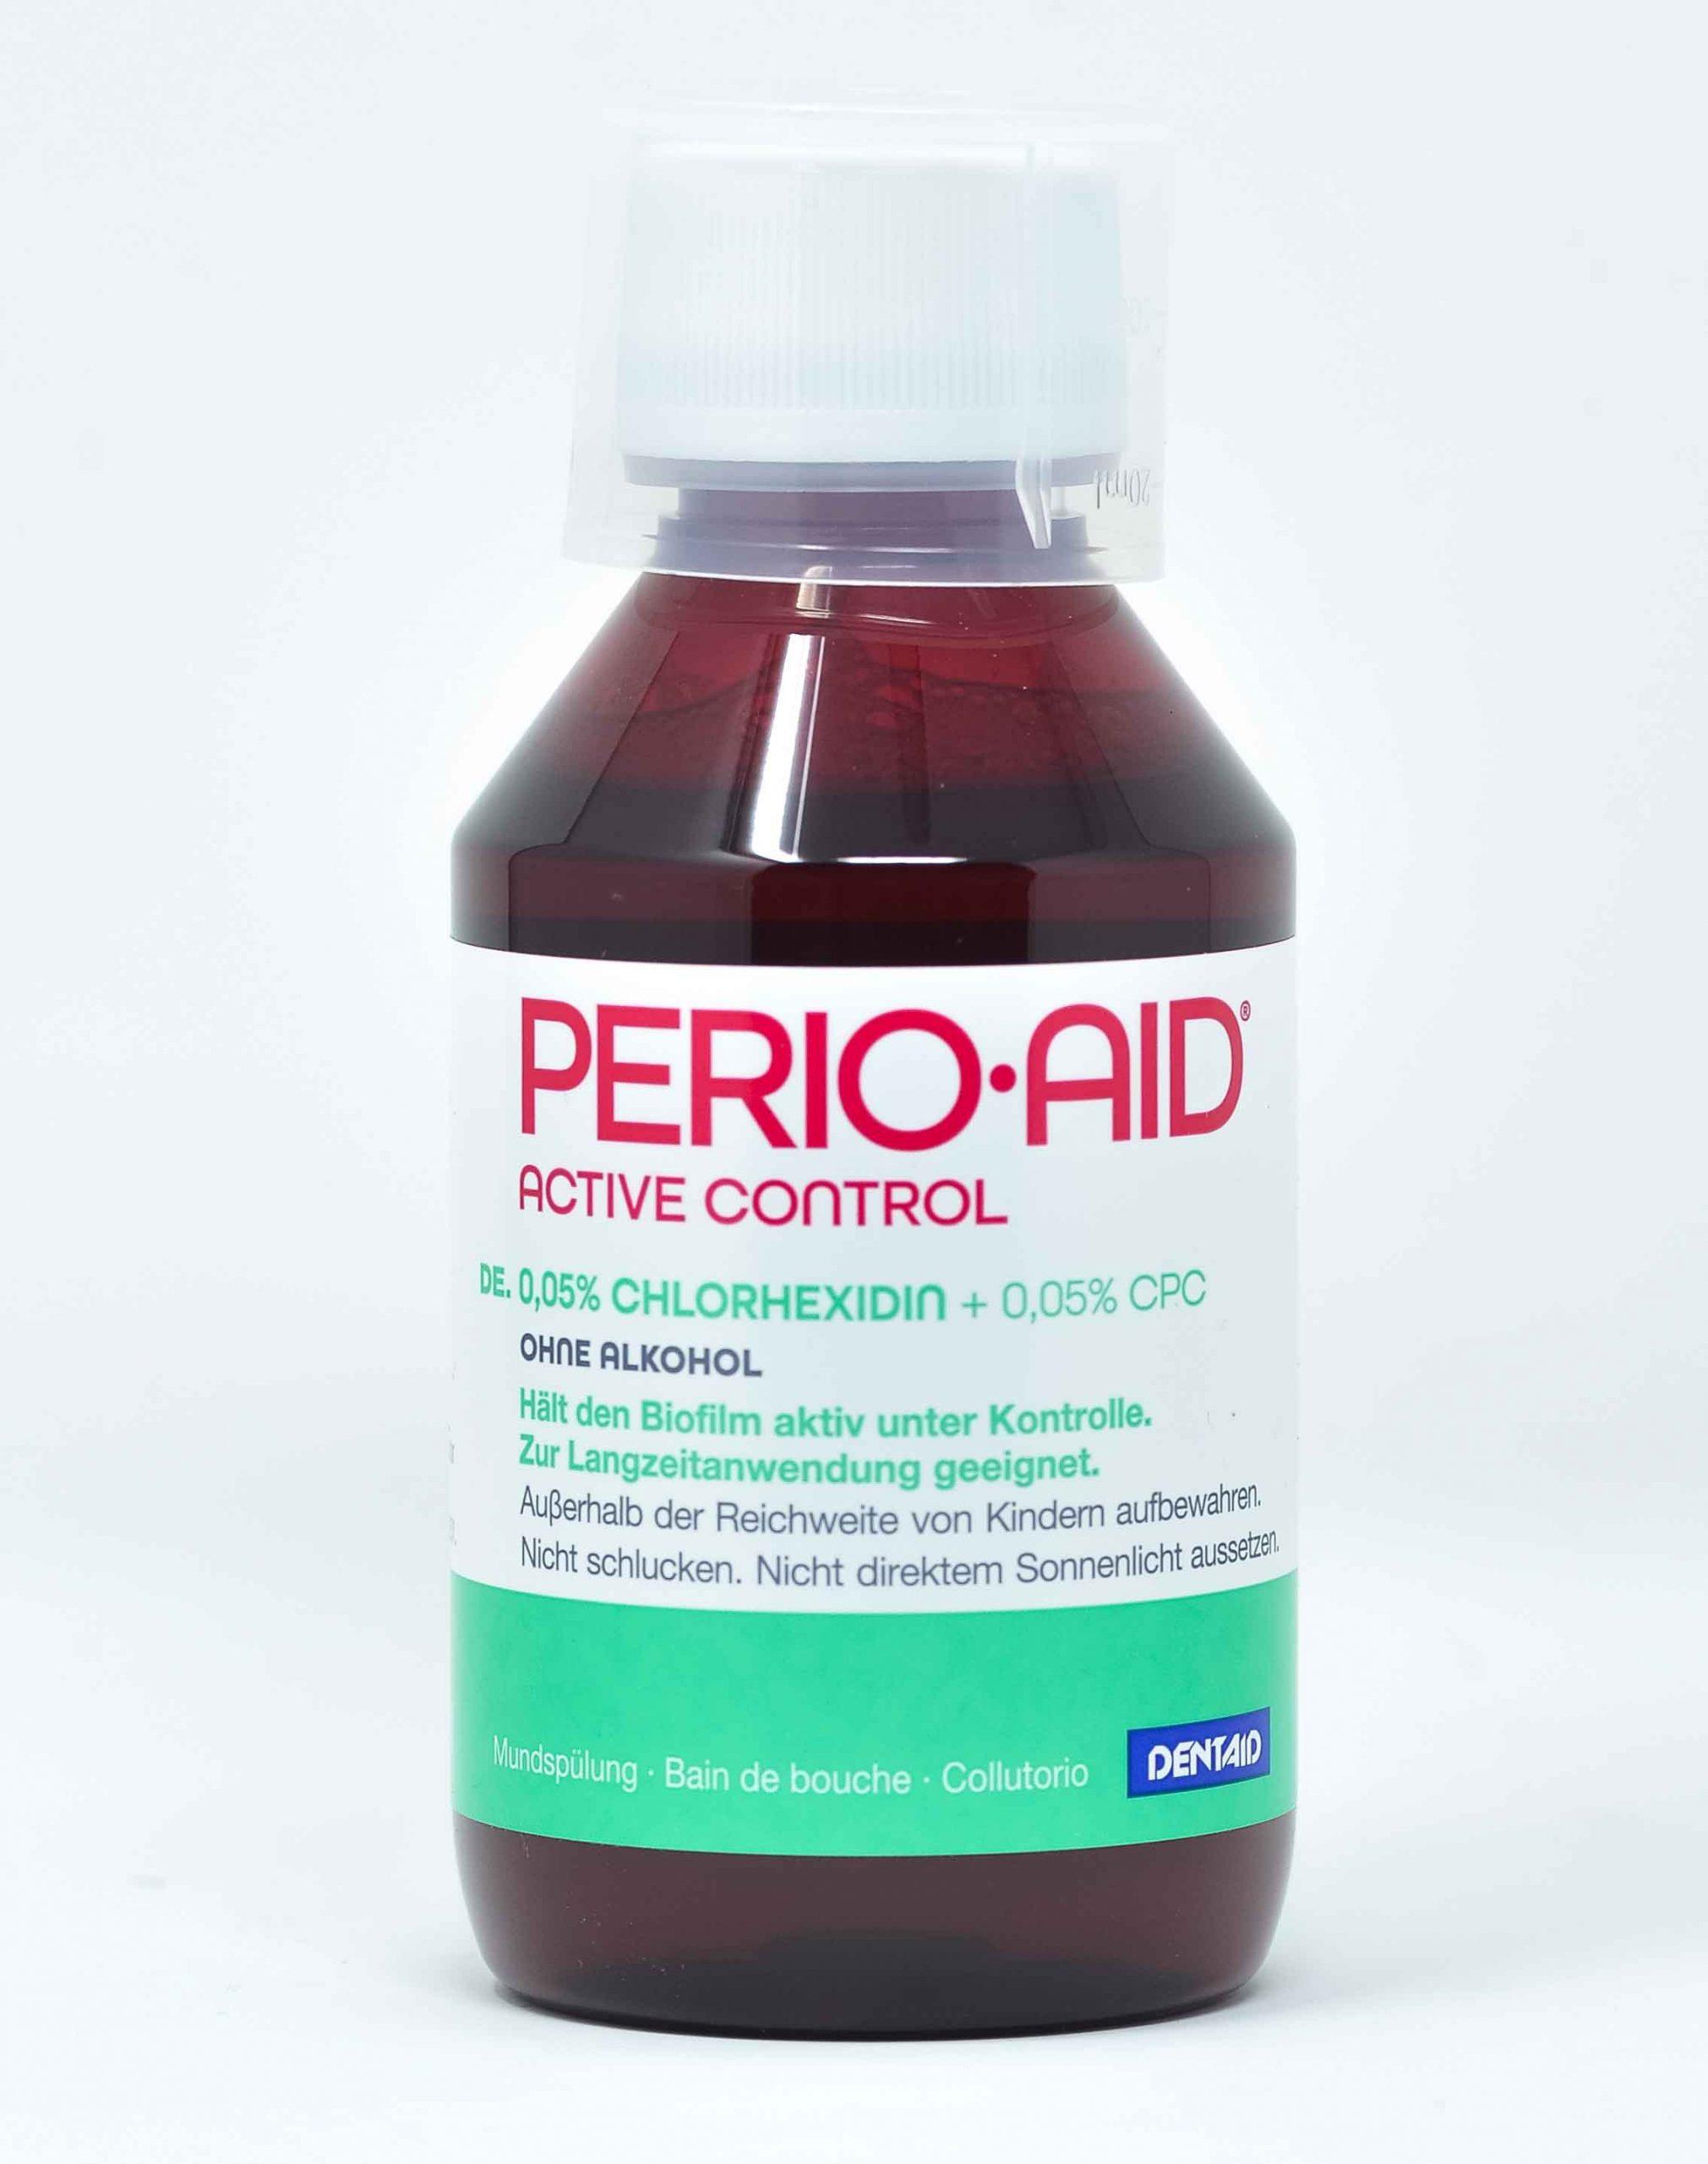 Dentaid Collutorio Perio Aid Active Control CHX 0,05% + CPC 0,05% - 150 ml